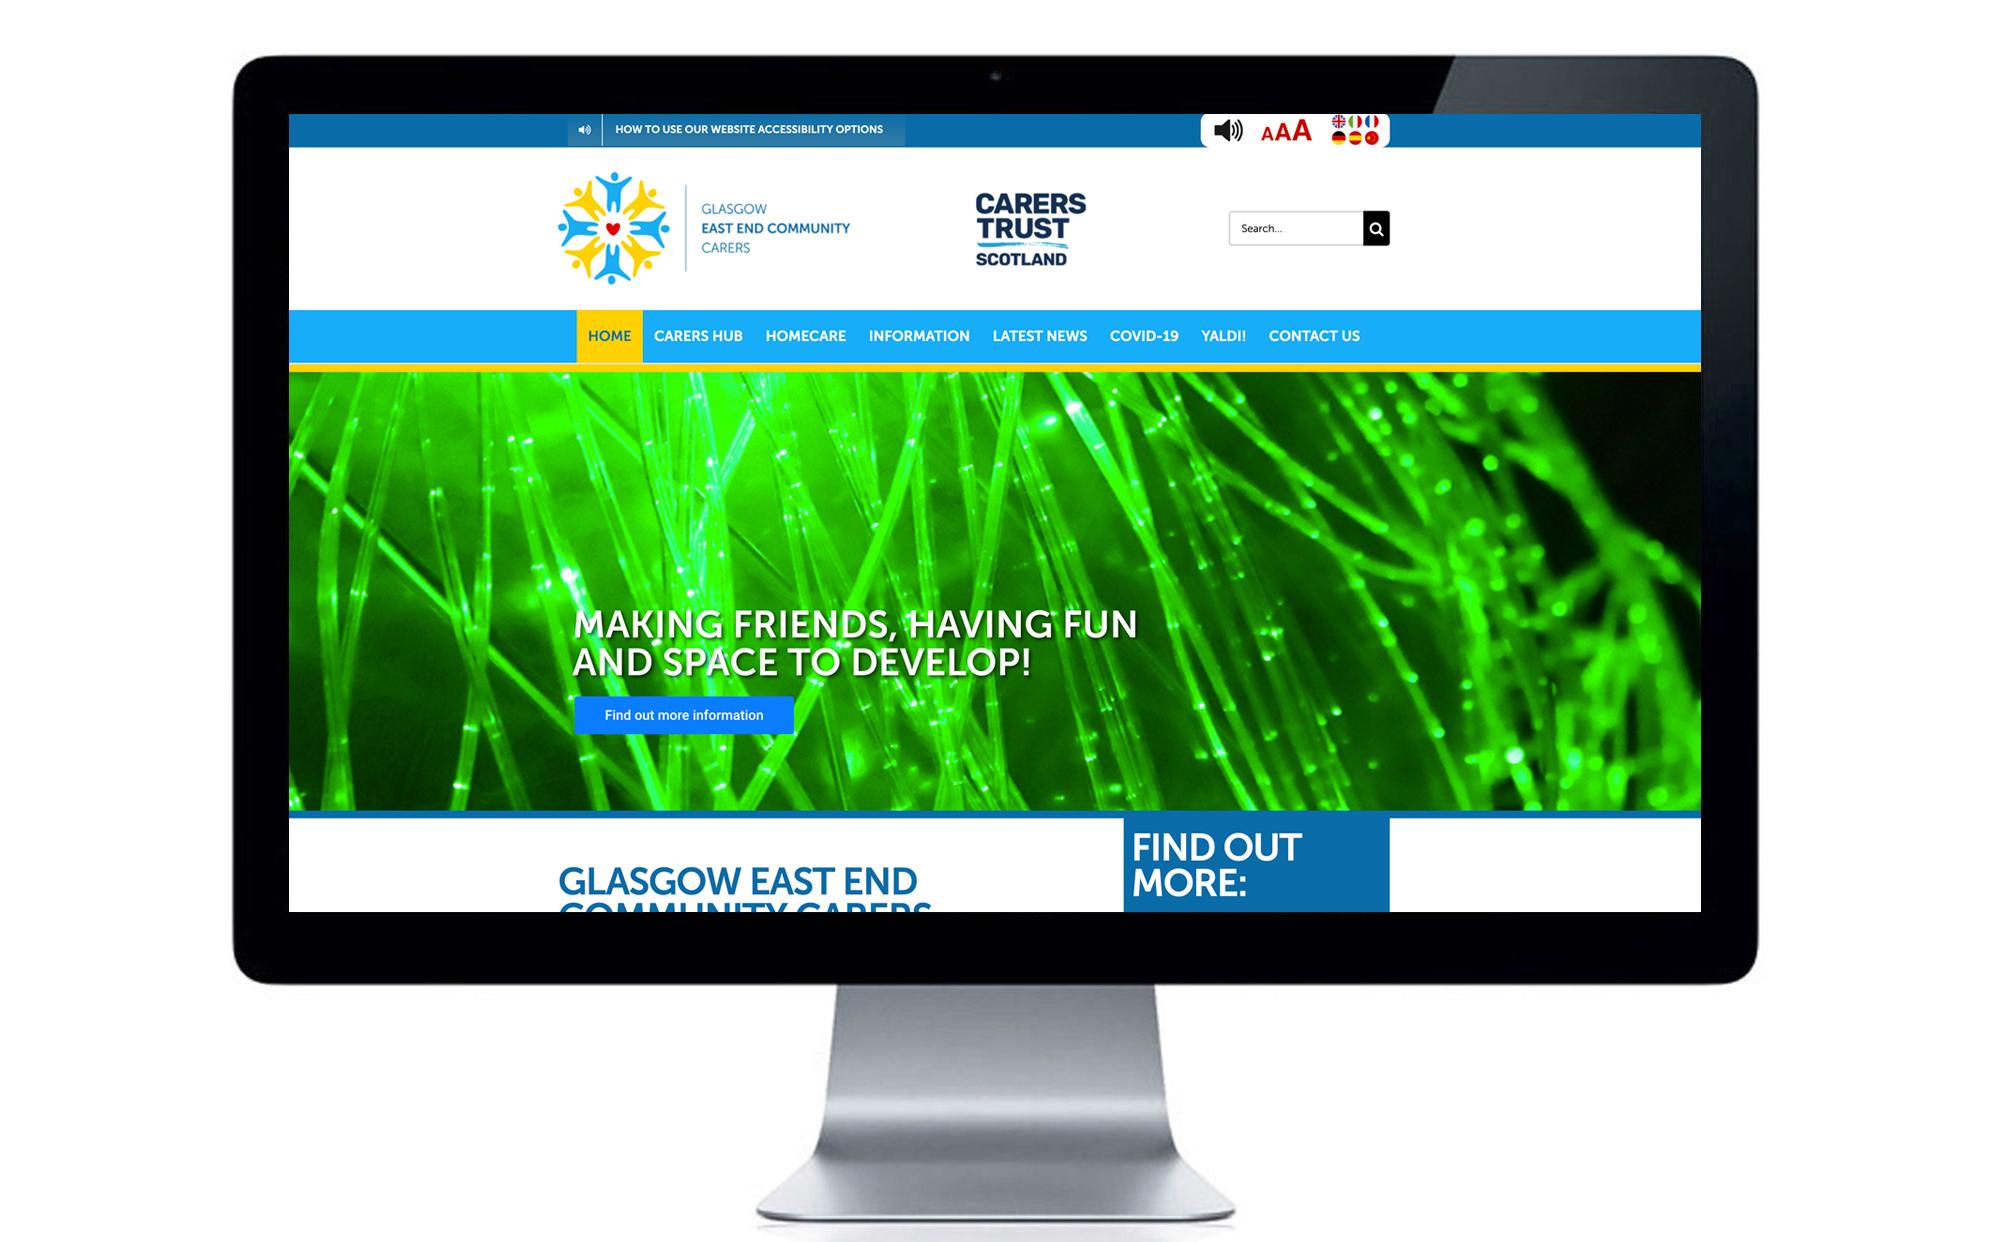 GEECC Website Image 1